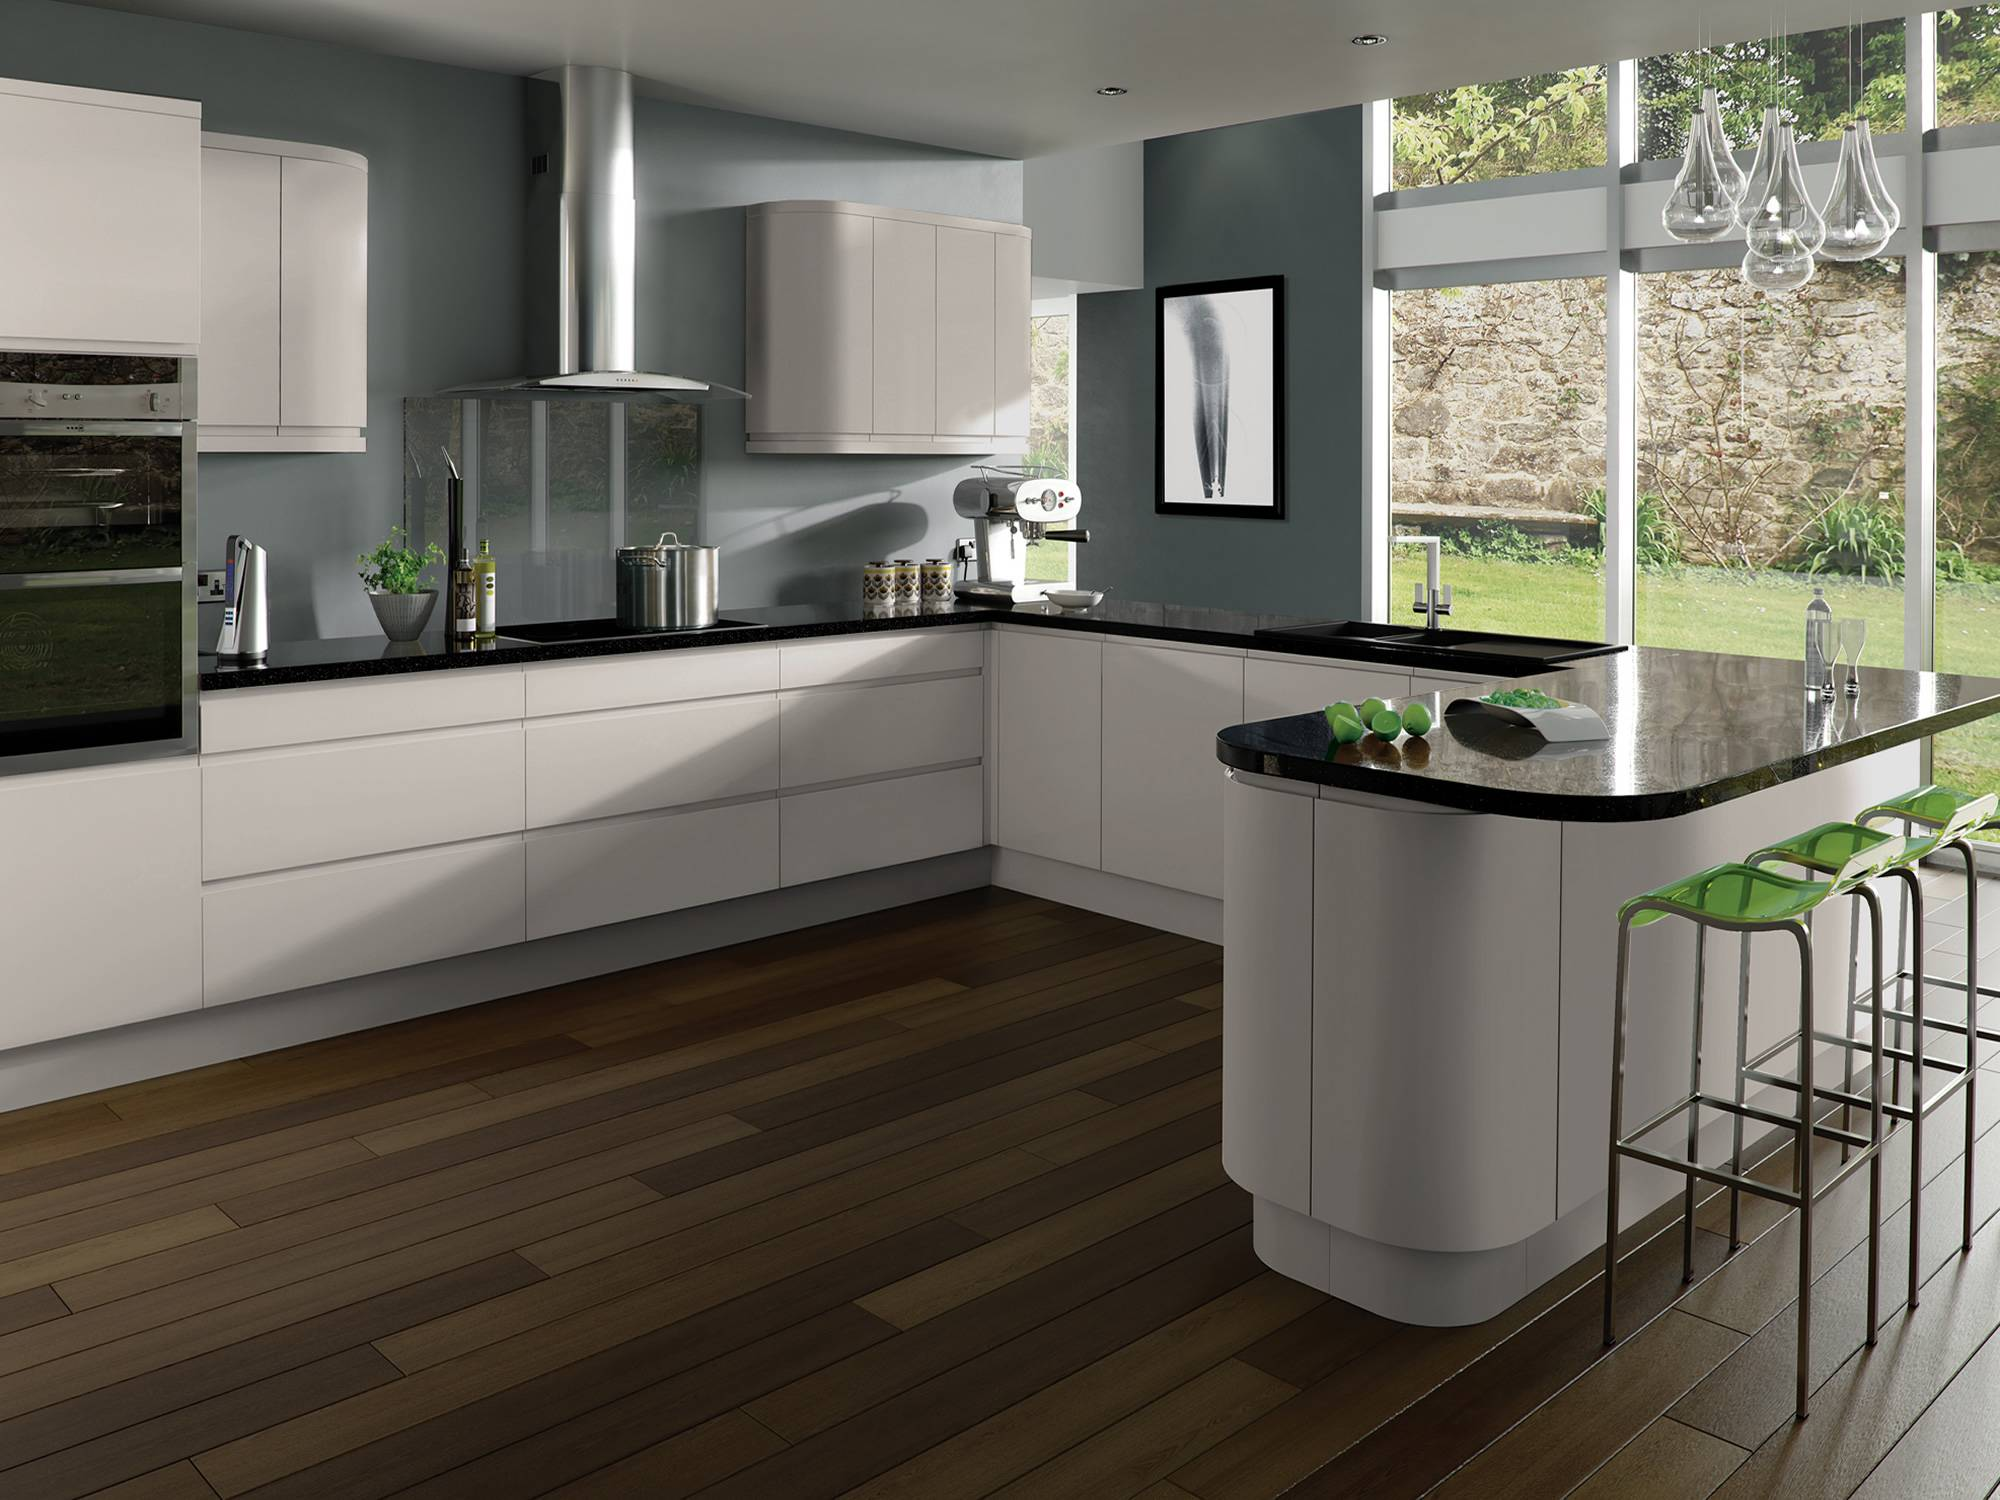 Integra Matt Kashmir Kitchens and Kitchen Design